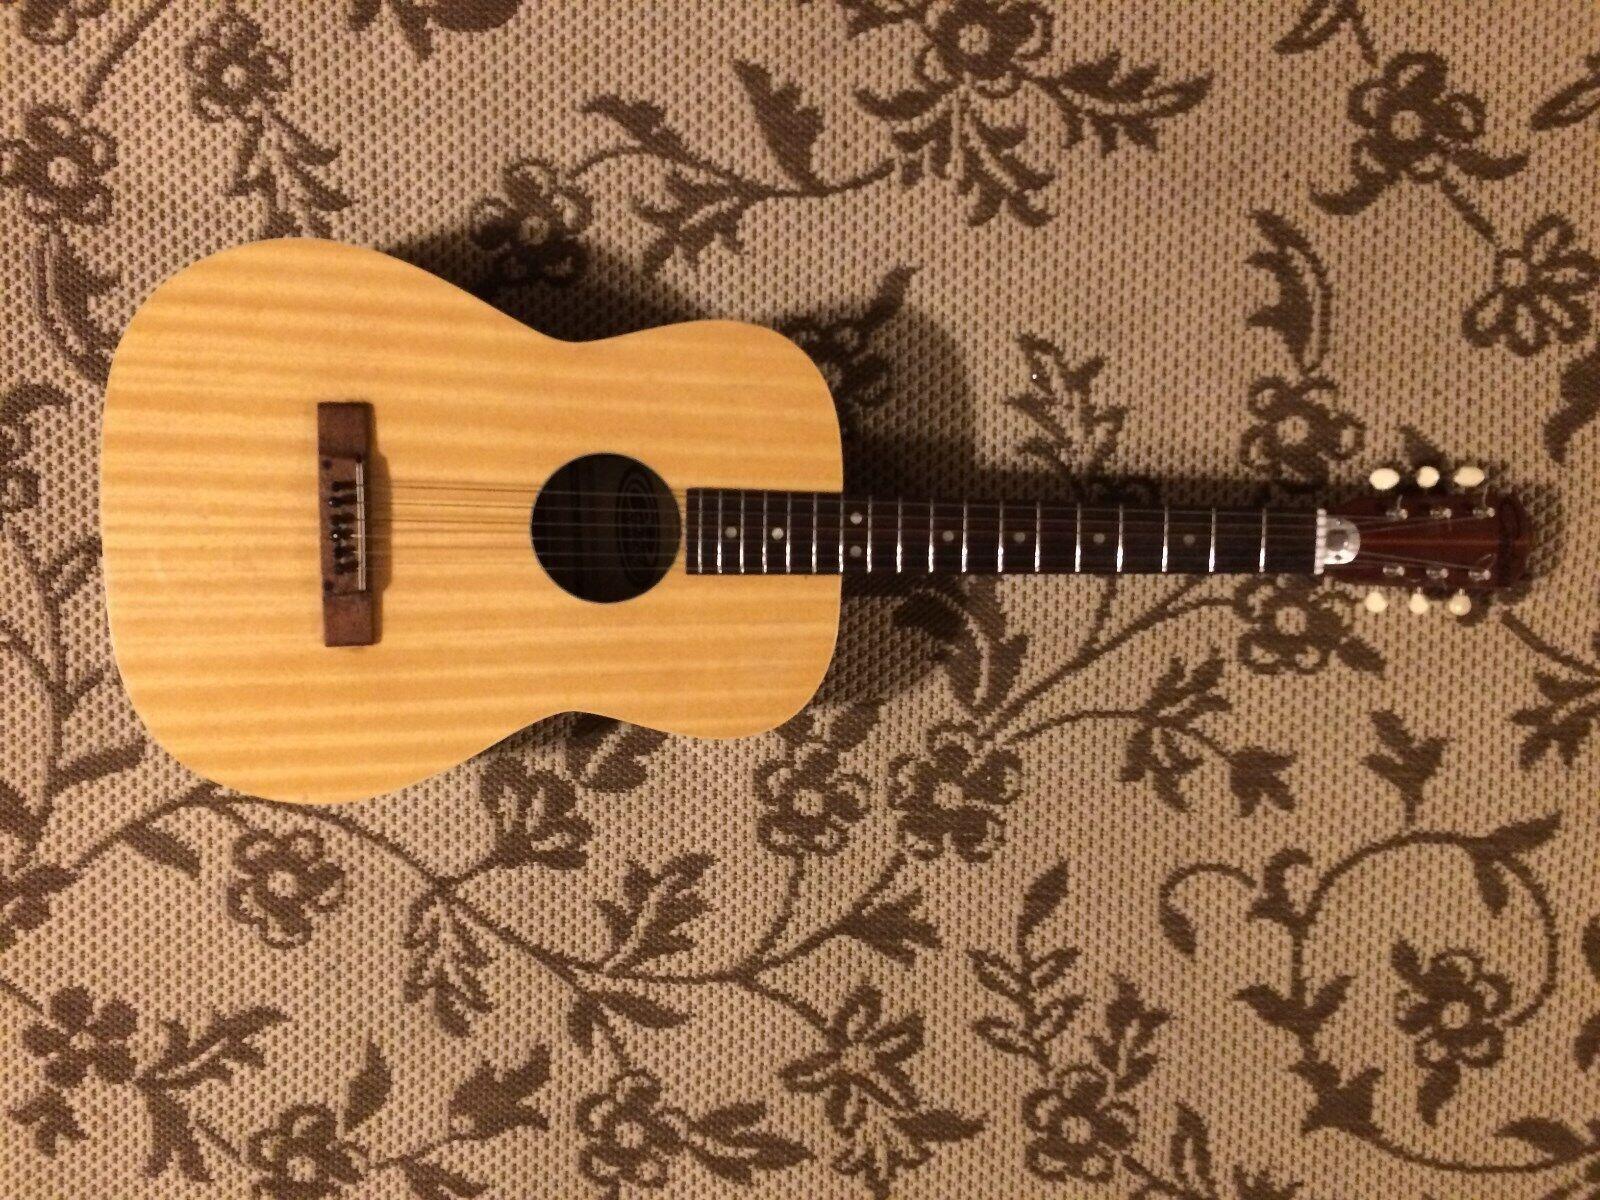 Contessa HG-01 Acoustic Guitar 60's Natural